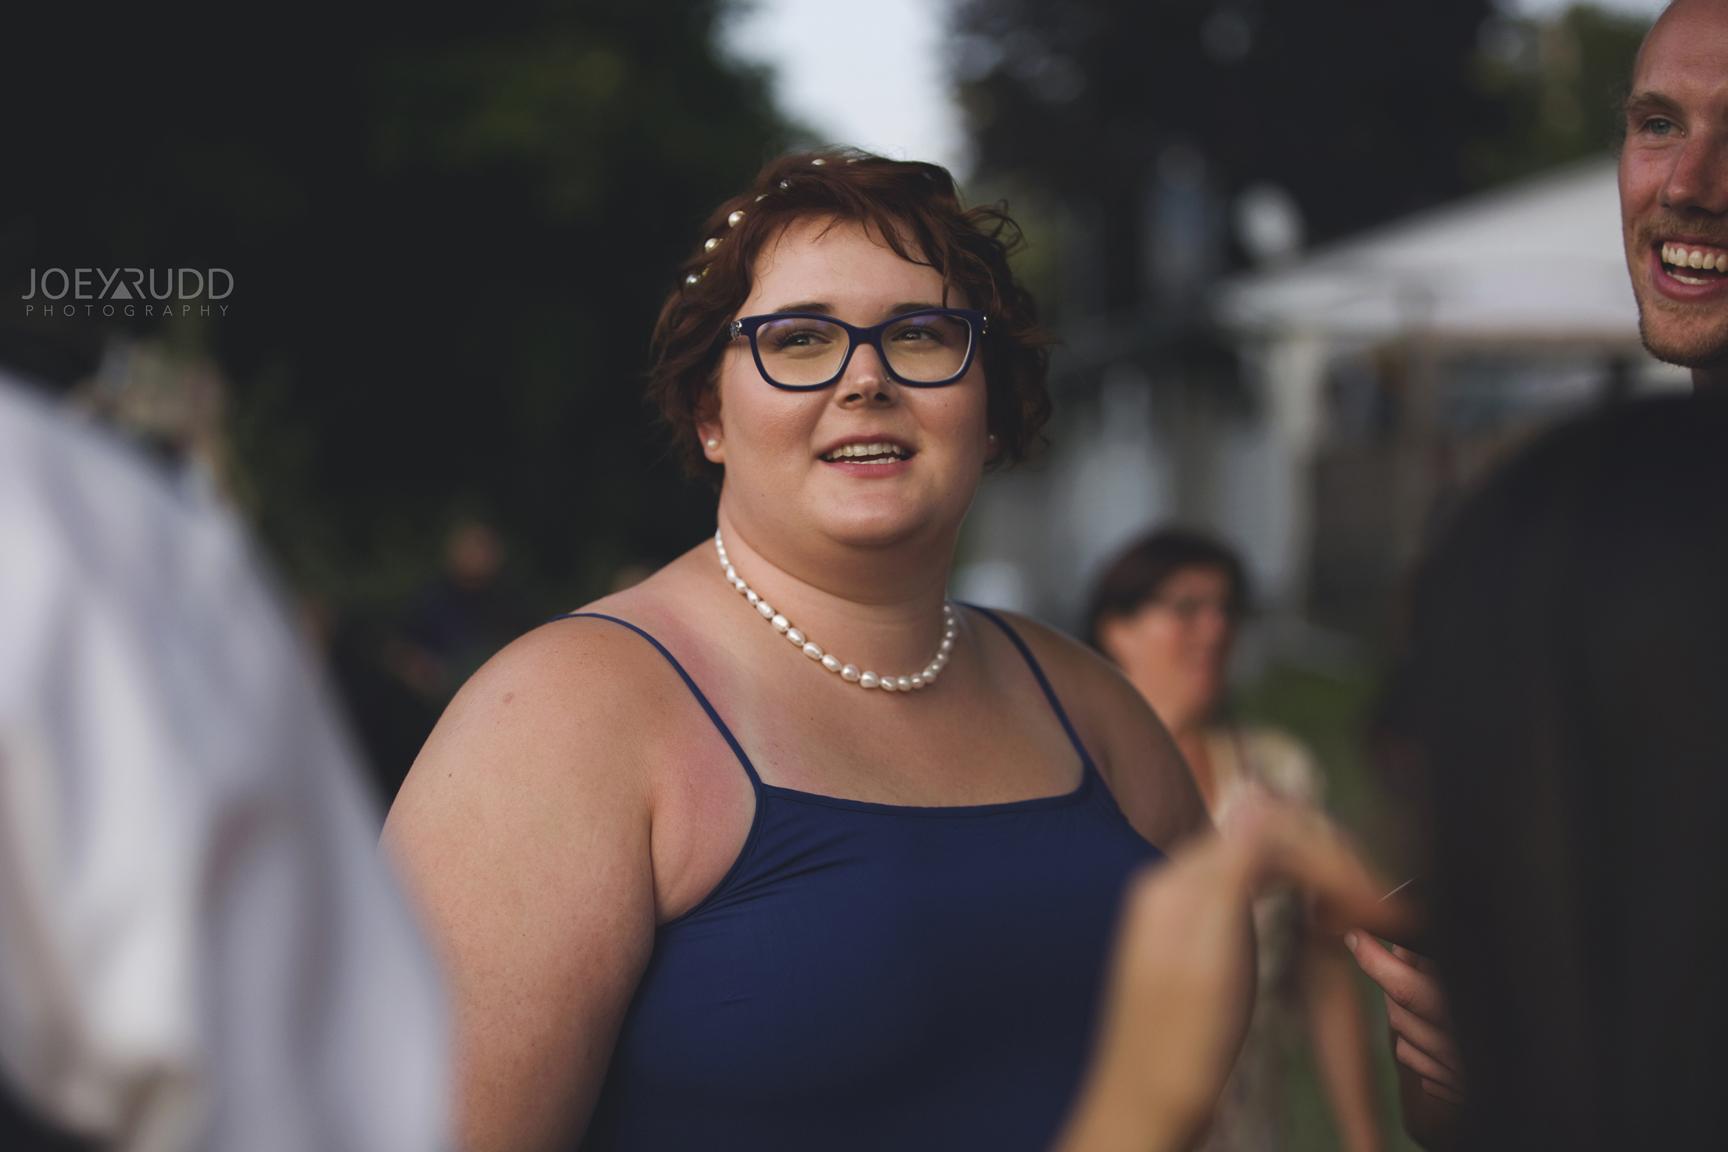 Backyard Kingston Wedding by Ottawa Wedding Photographer Joey Rudd Photography Candid Wedding Party